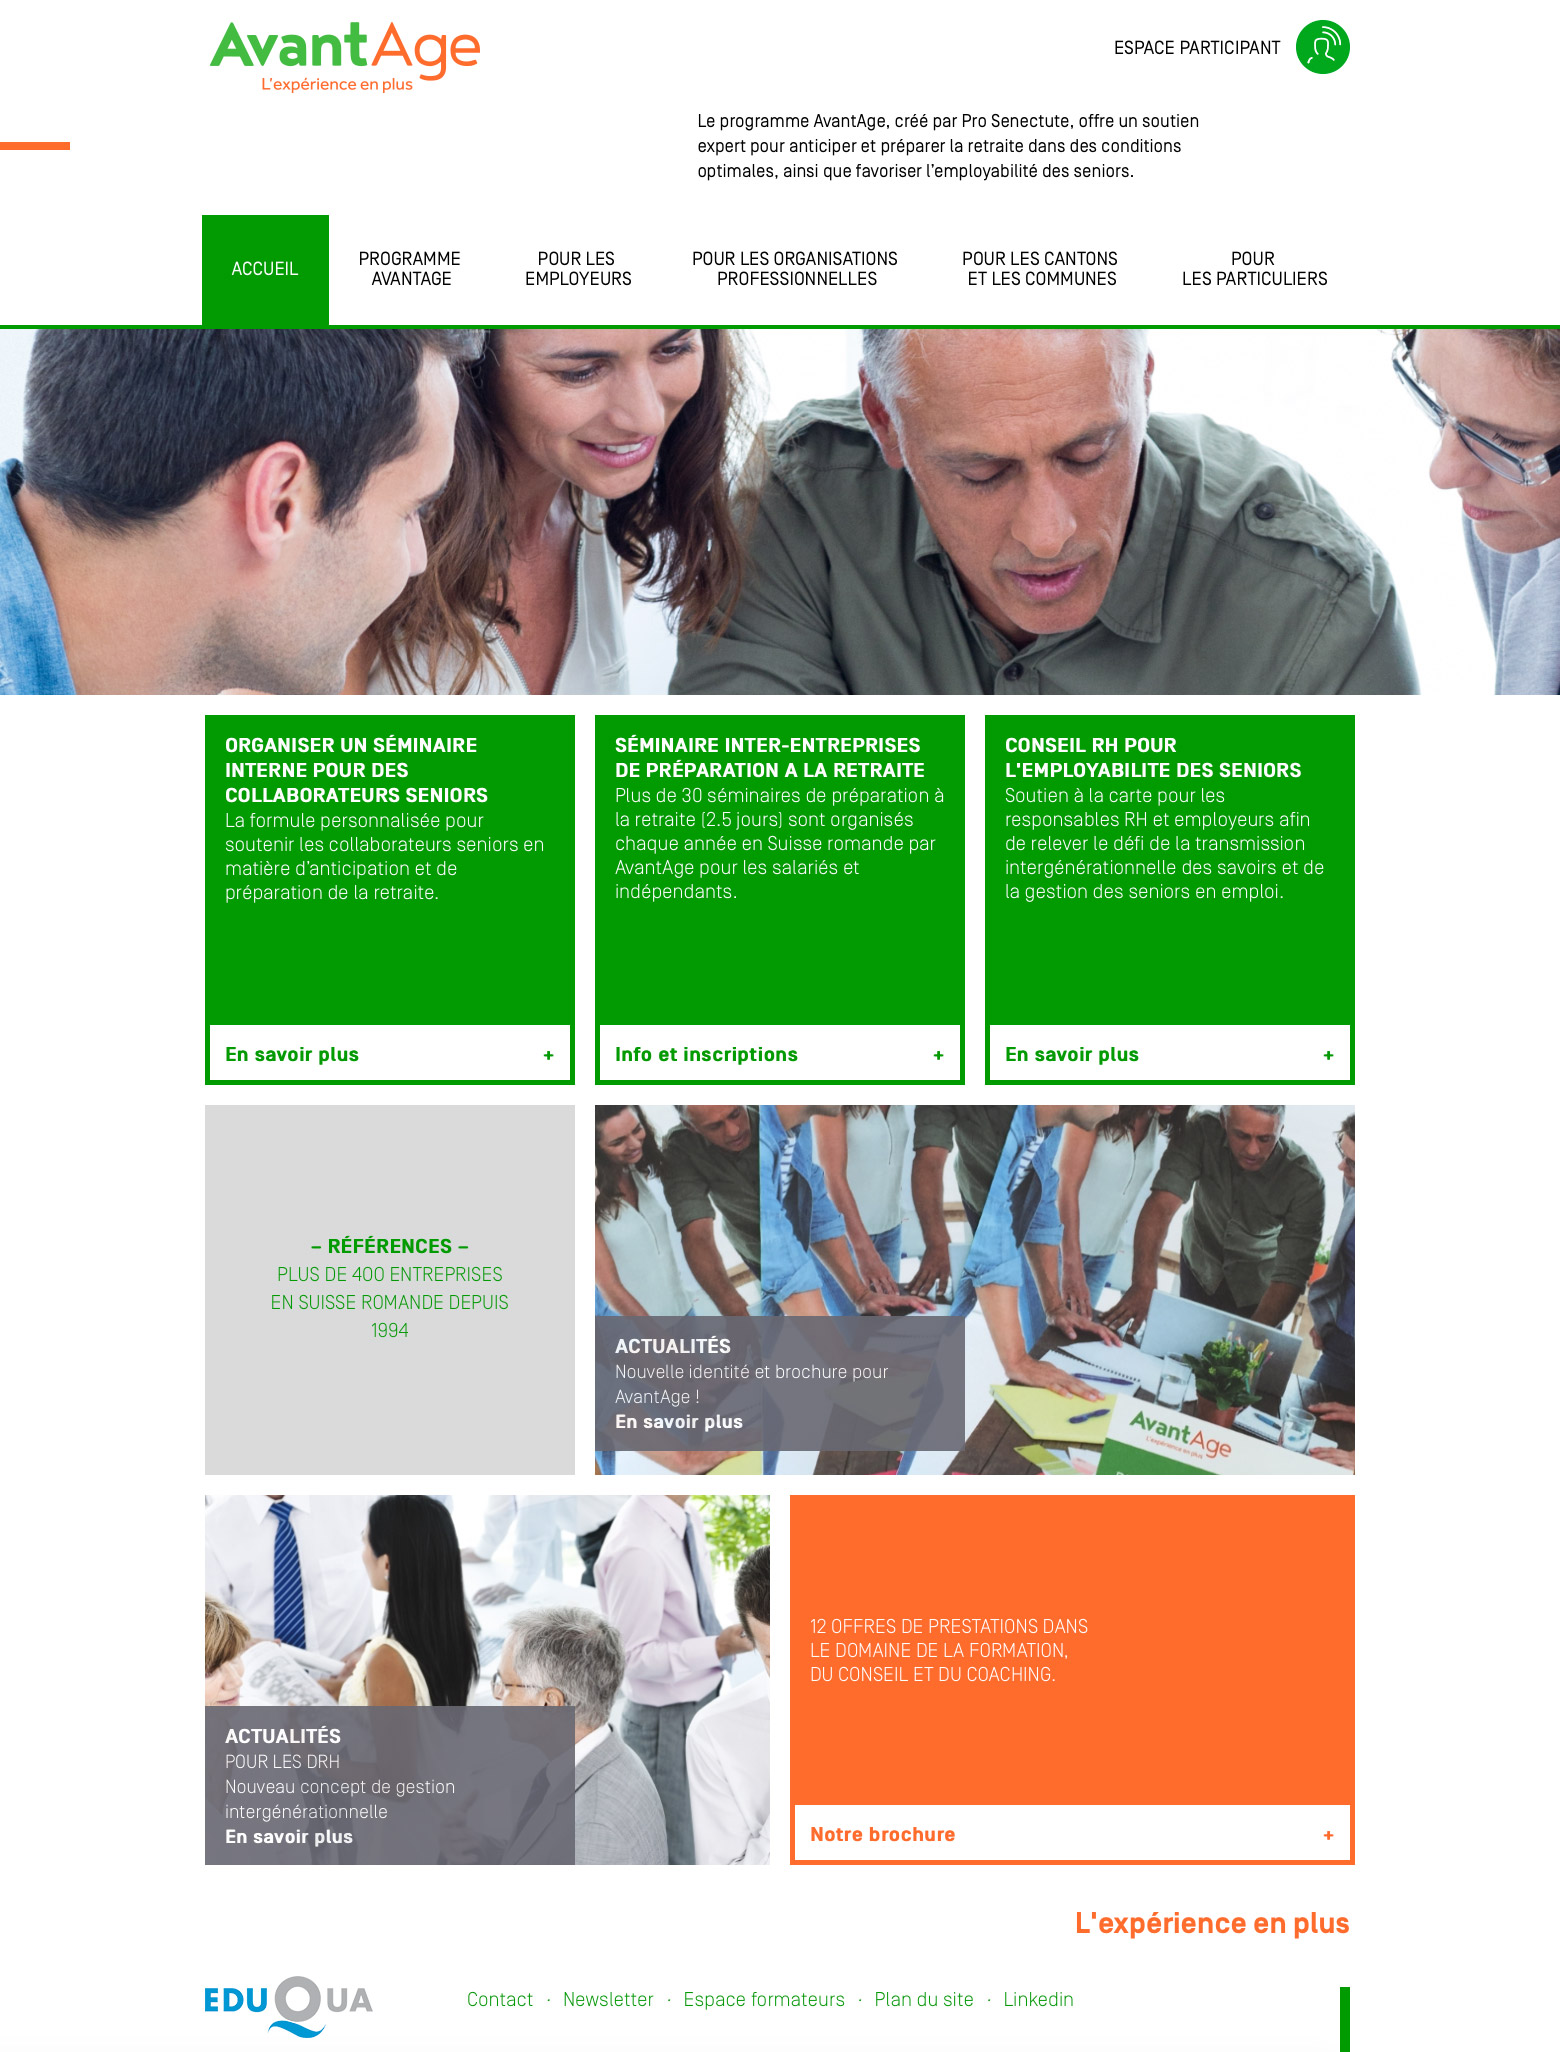 AvantAge WNG Agence Digitale